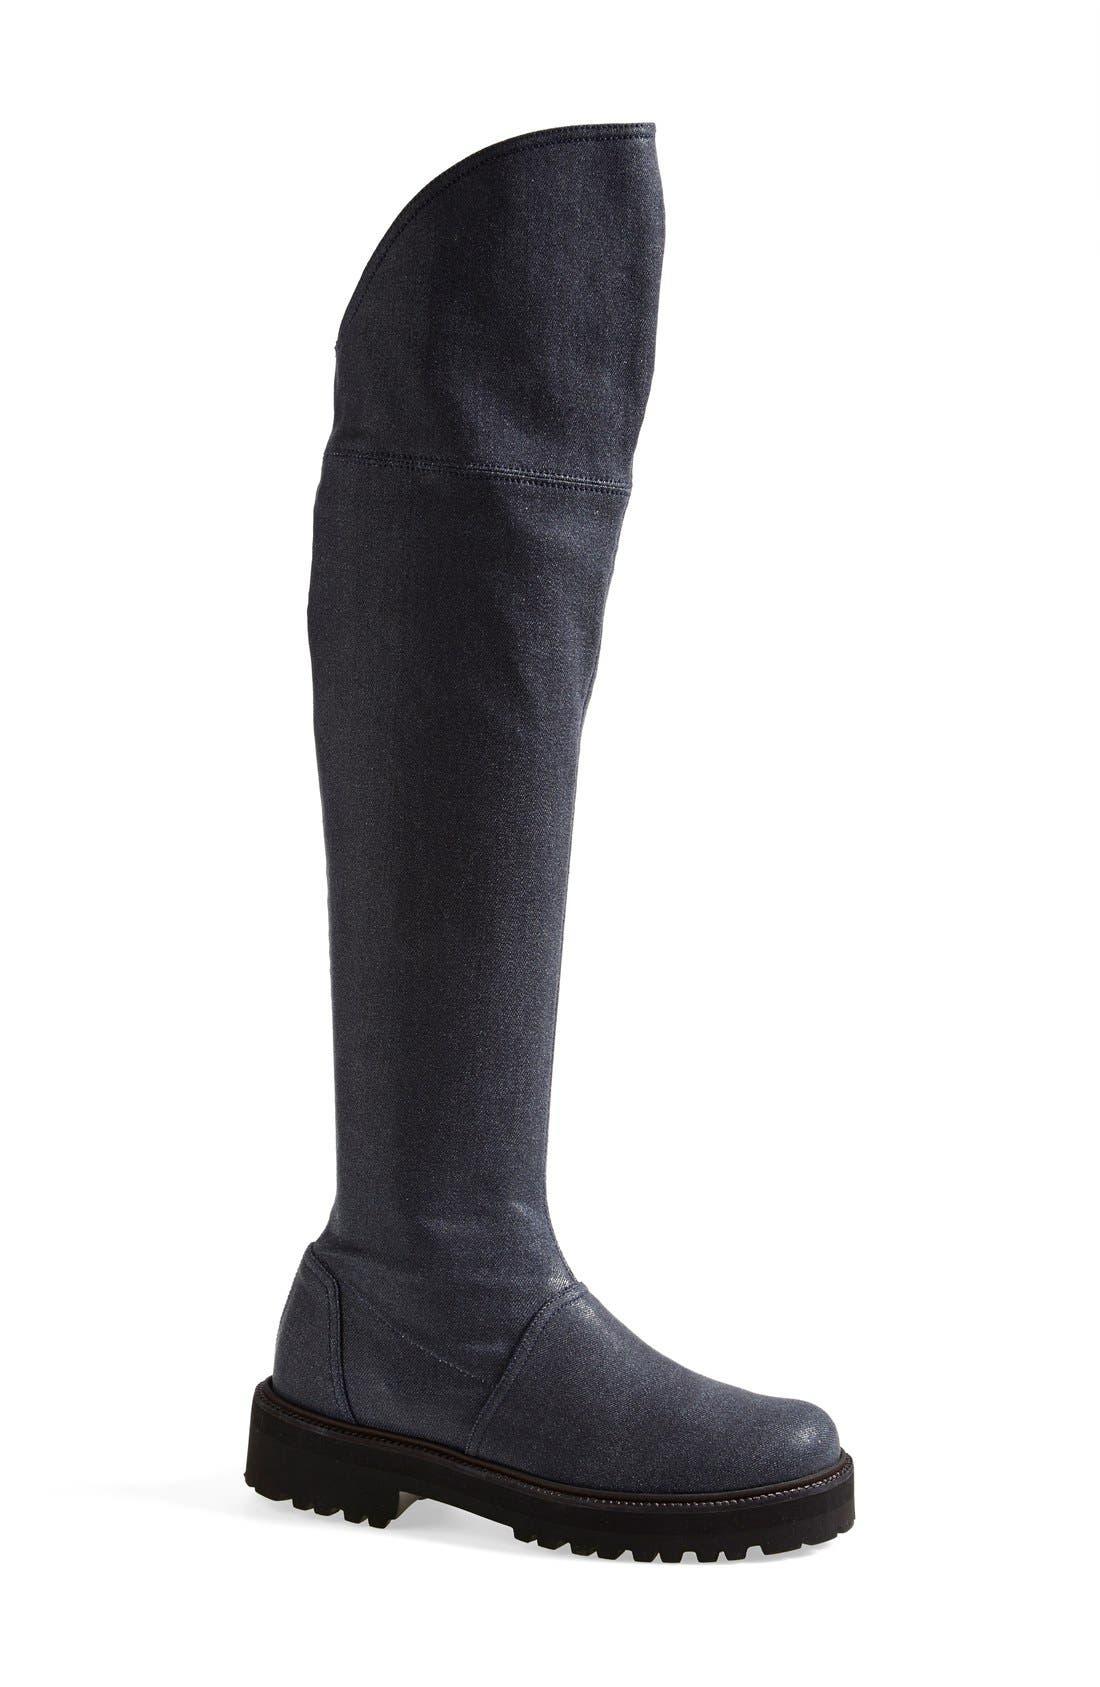 Main Image - MM6 Maison Margiela Over the Knee Boot (Women)